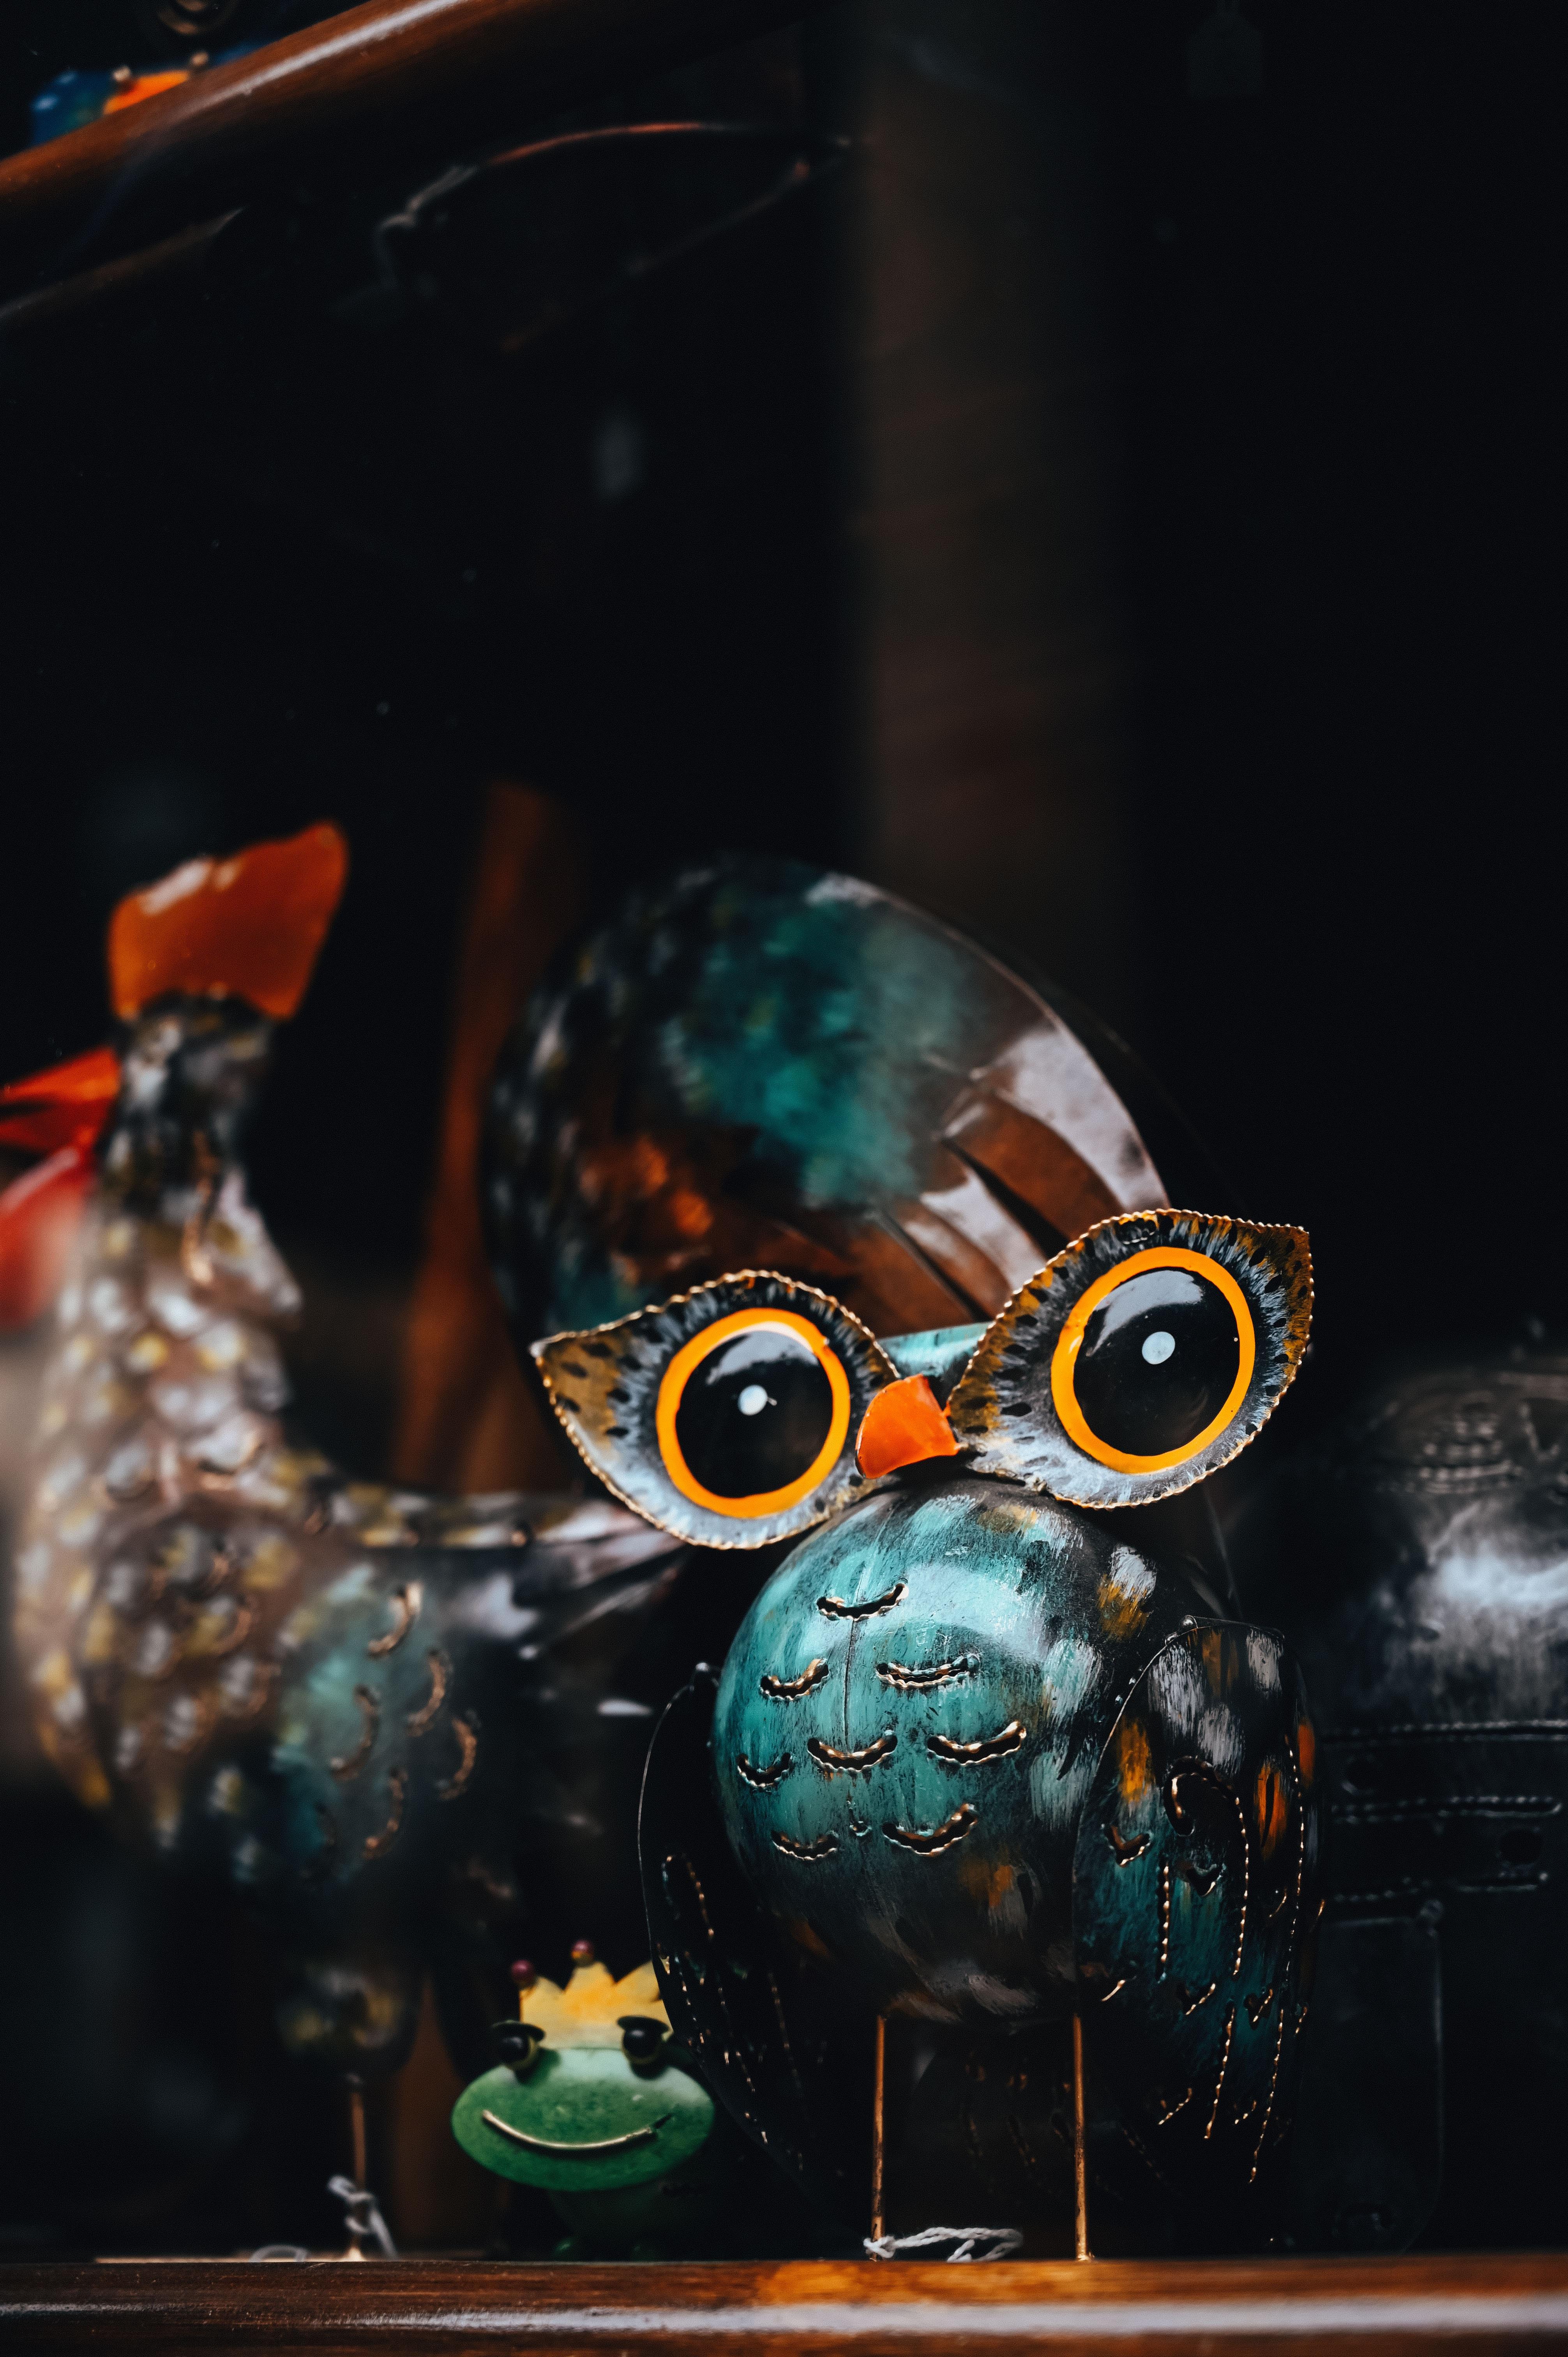 84371 download wallpaper Miscellanea, Miscellaneous, Owl, Bird, Souvenir, Ceramics, Craft, Handmade screensavers and pictures for free